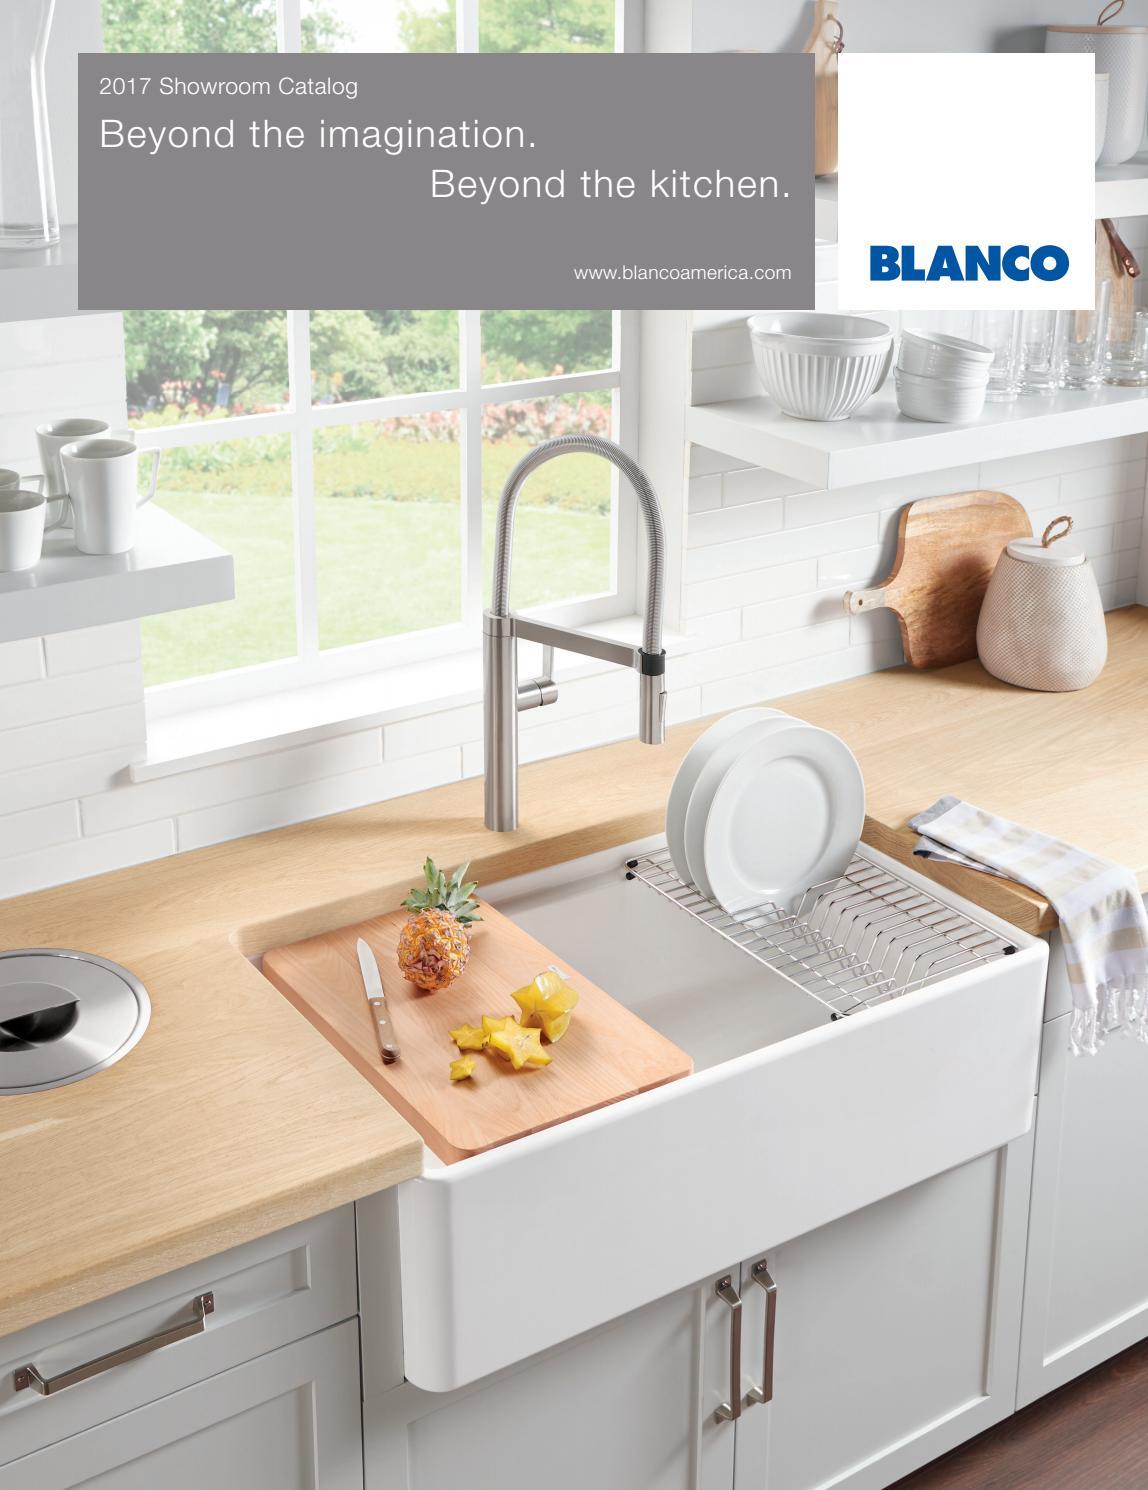 Blanco 2017 Showroom Catalog By Lori Dolnick Issuu